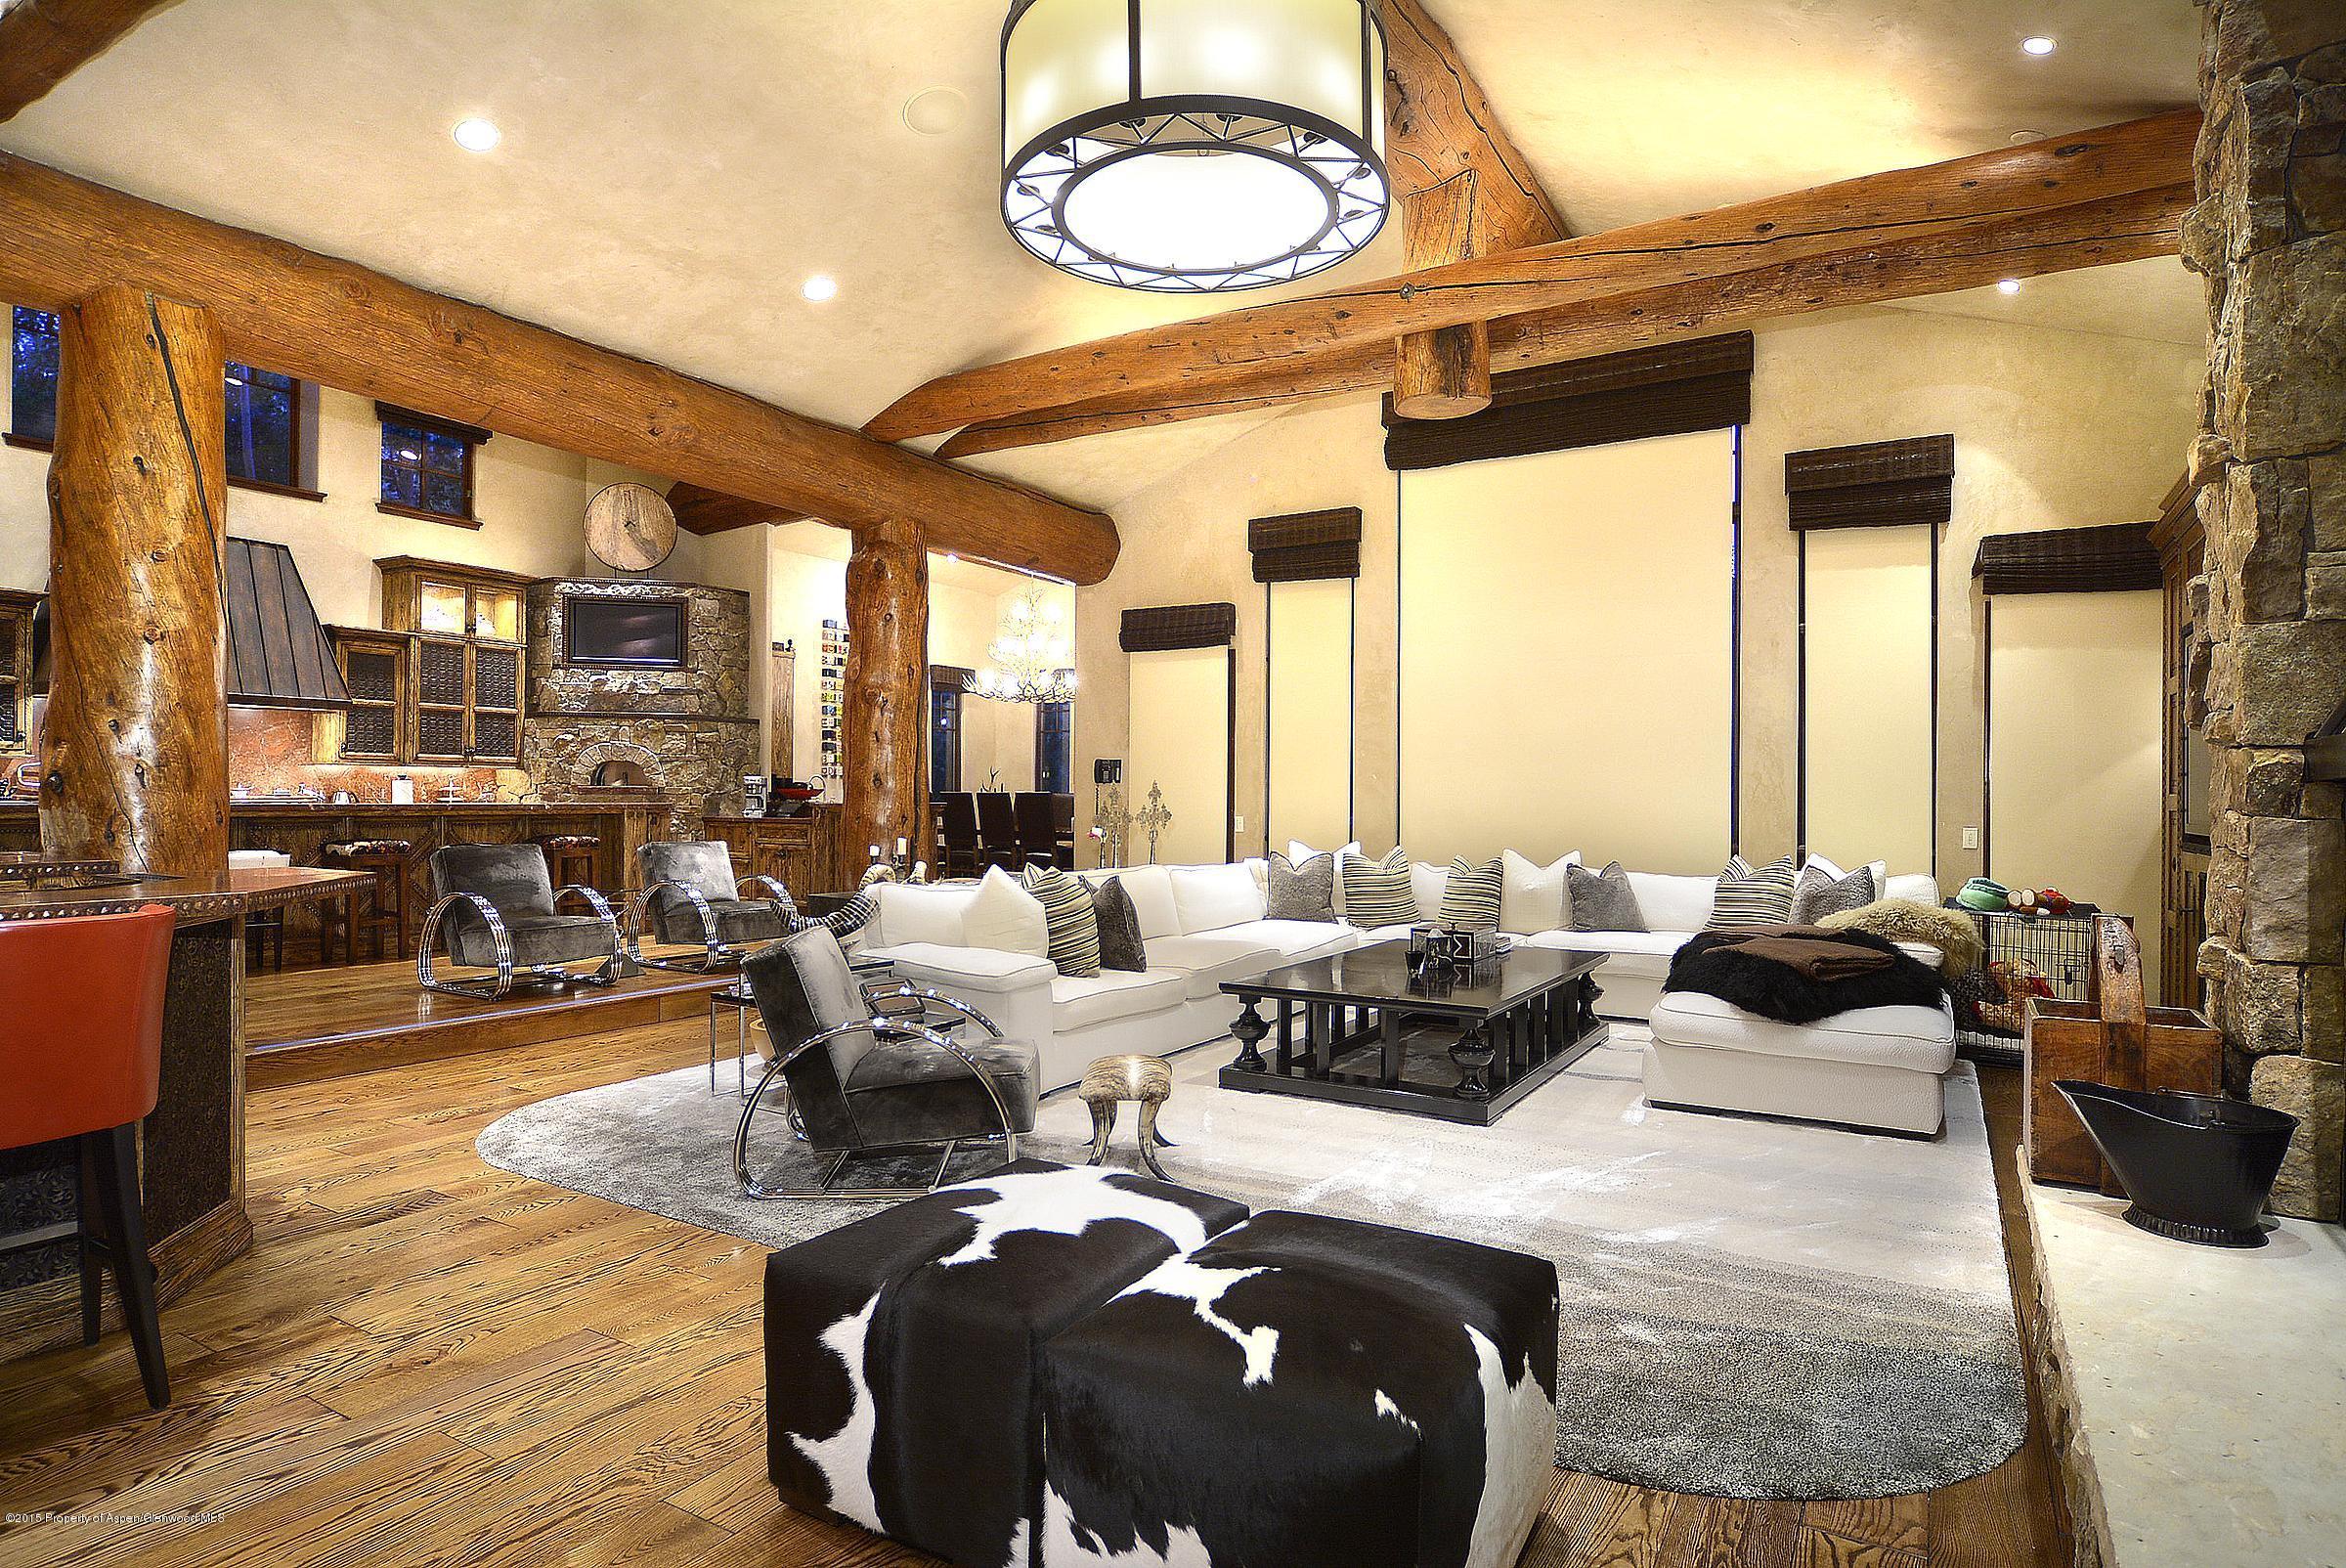 621 Pine Crest Drive,Snowmass Village,Colorado 81615,5 Bedrooms Bedrooms,7 BathroomsBathrooms,Residential Rentals,Pine Crest,140234